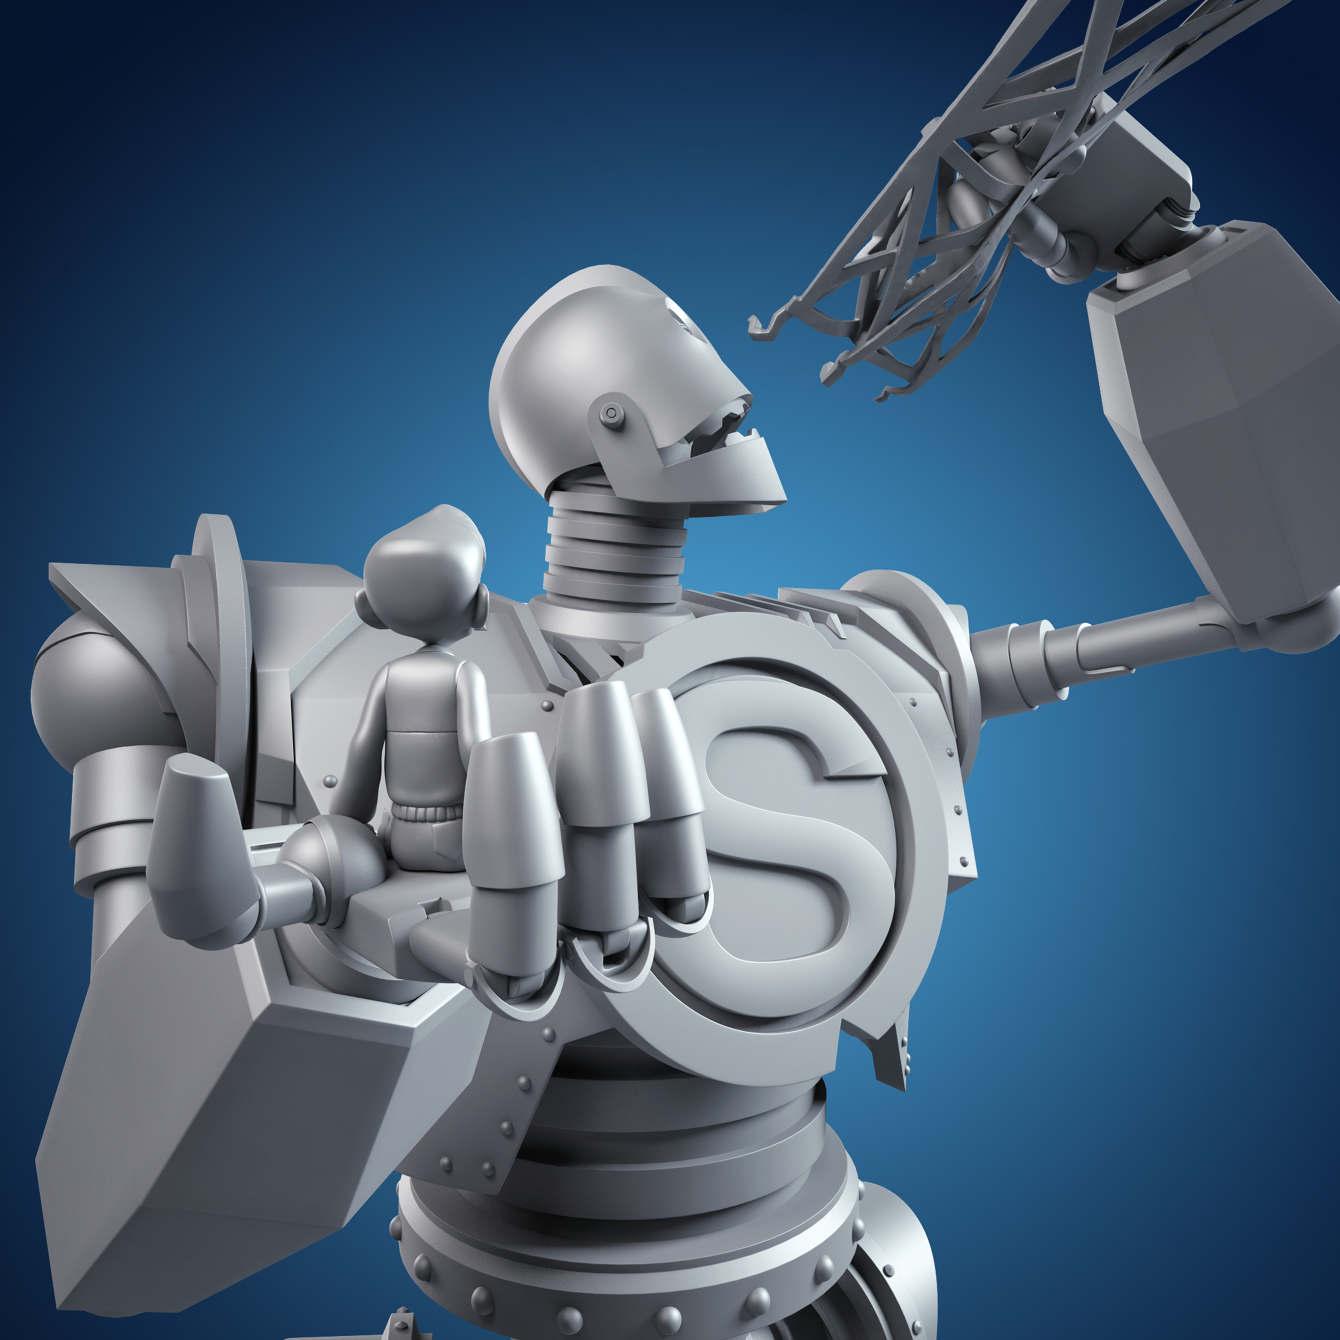 Iron-Giant-figure-Mondo-Giant1_1340_c.jpg